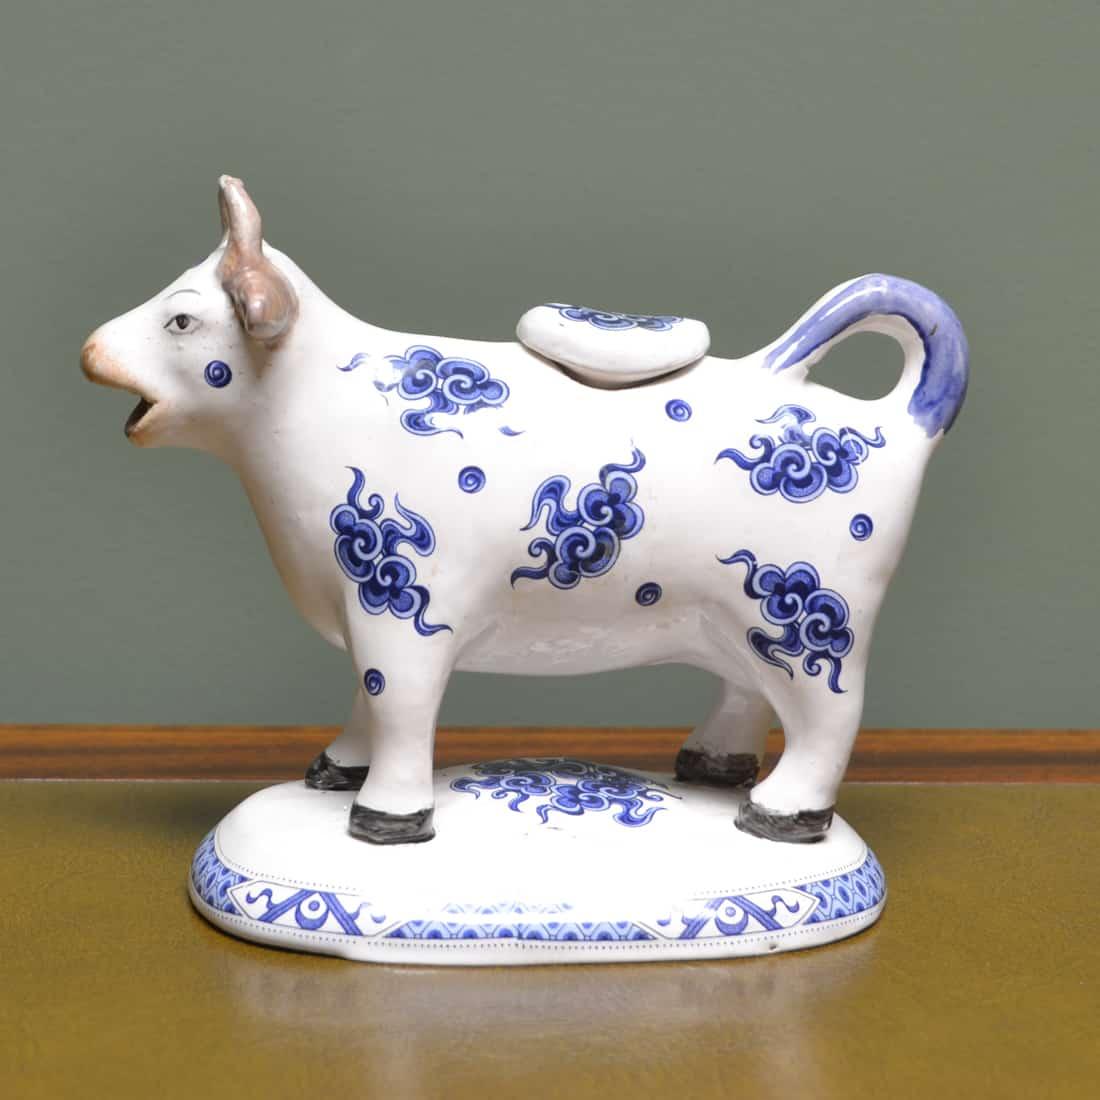 19th Century Blue & White Victorian Staffordshire Pottery Cow Creamer